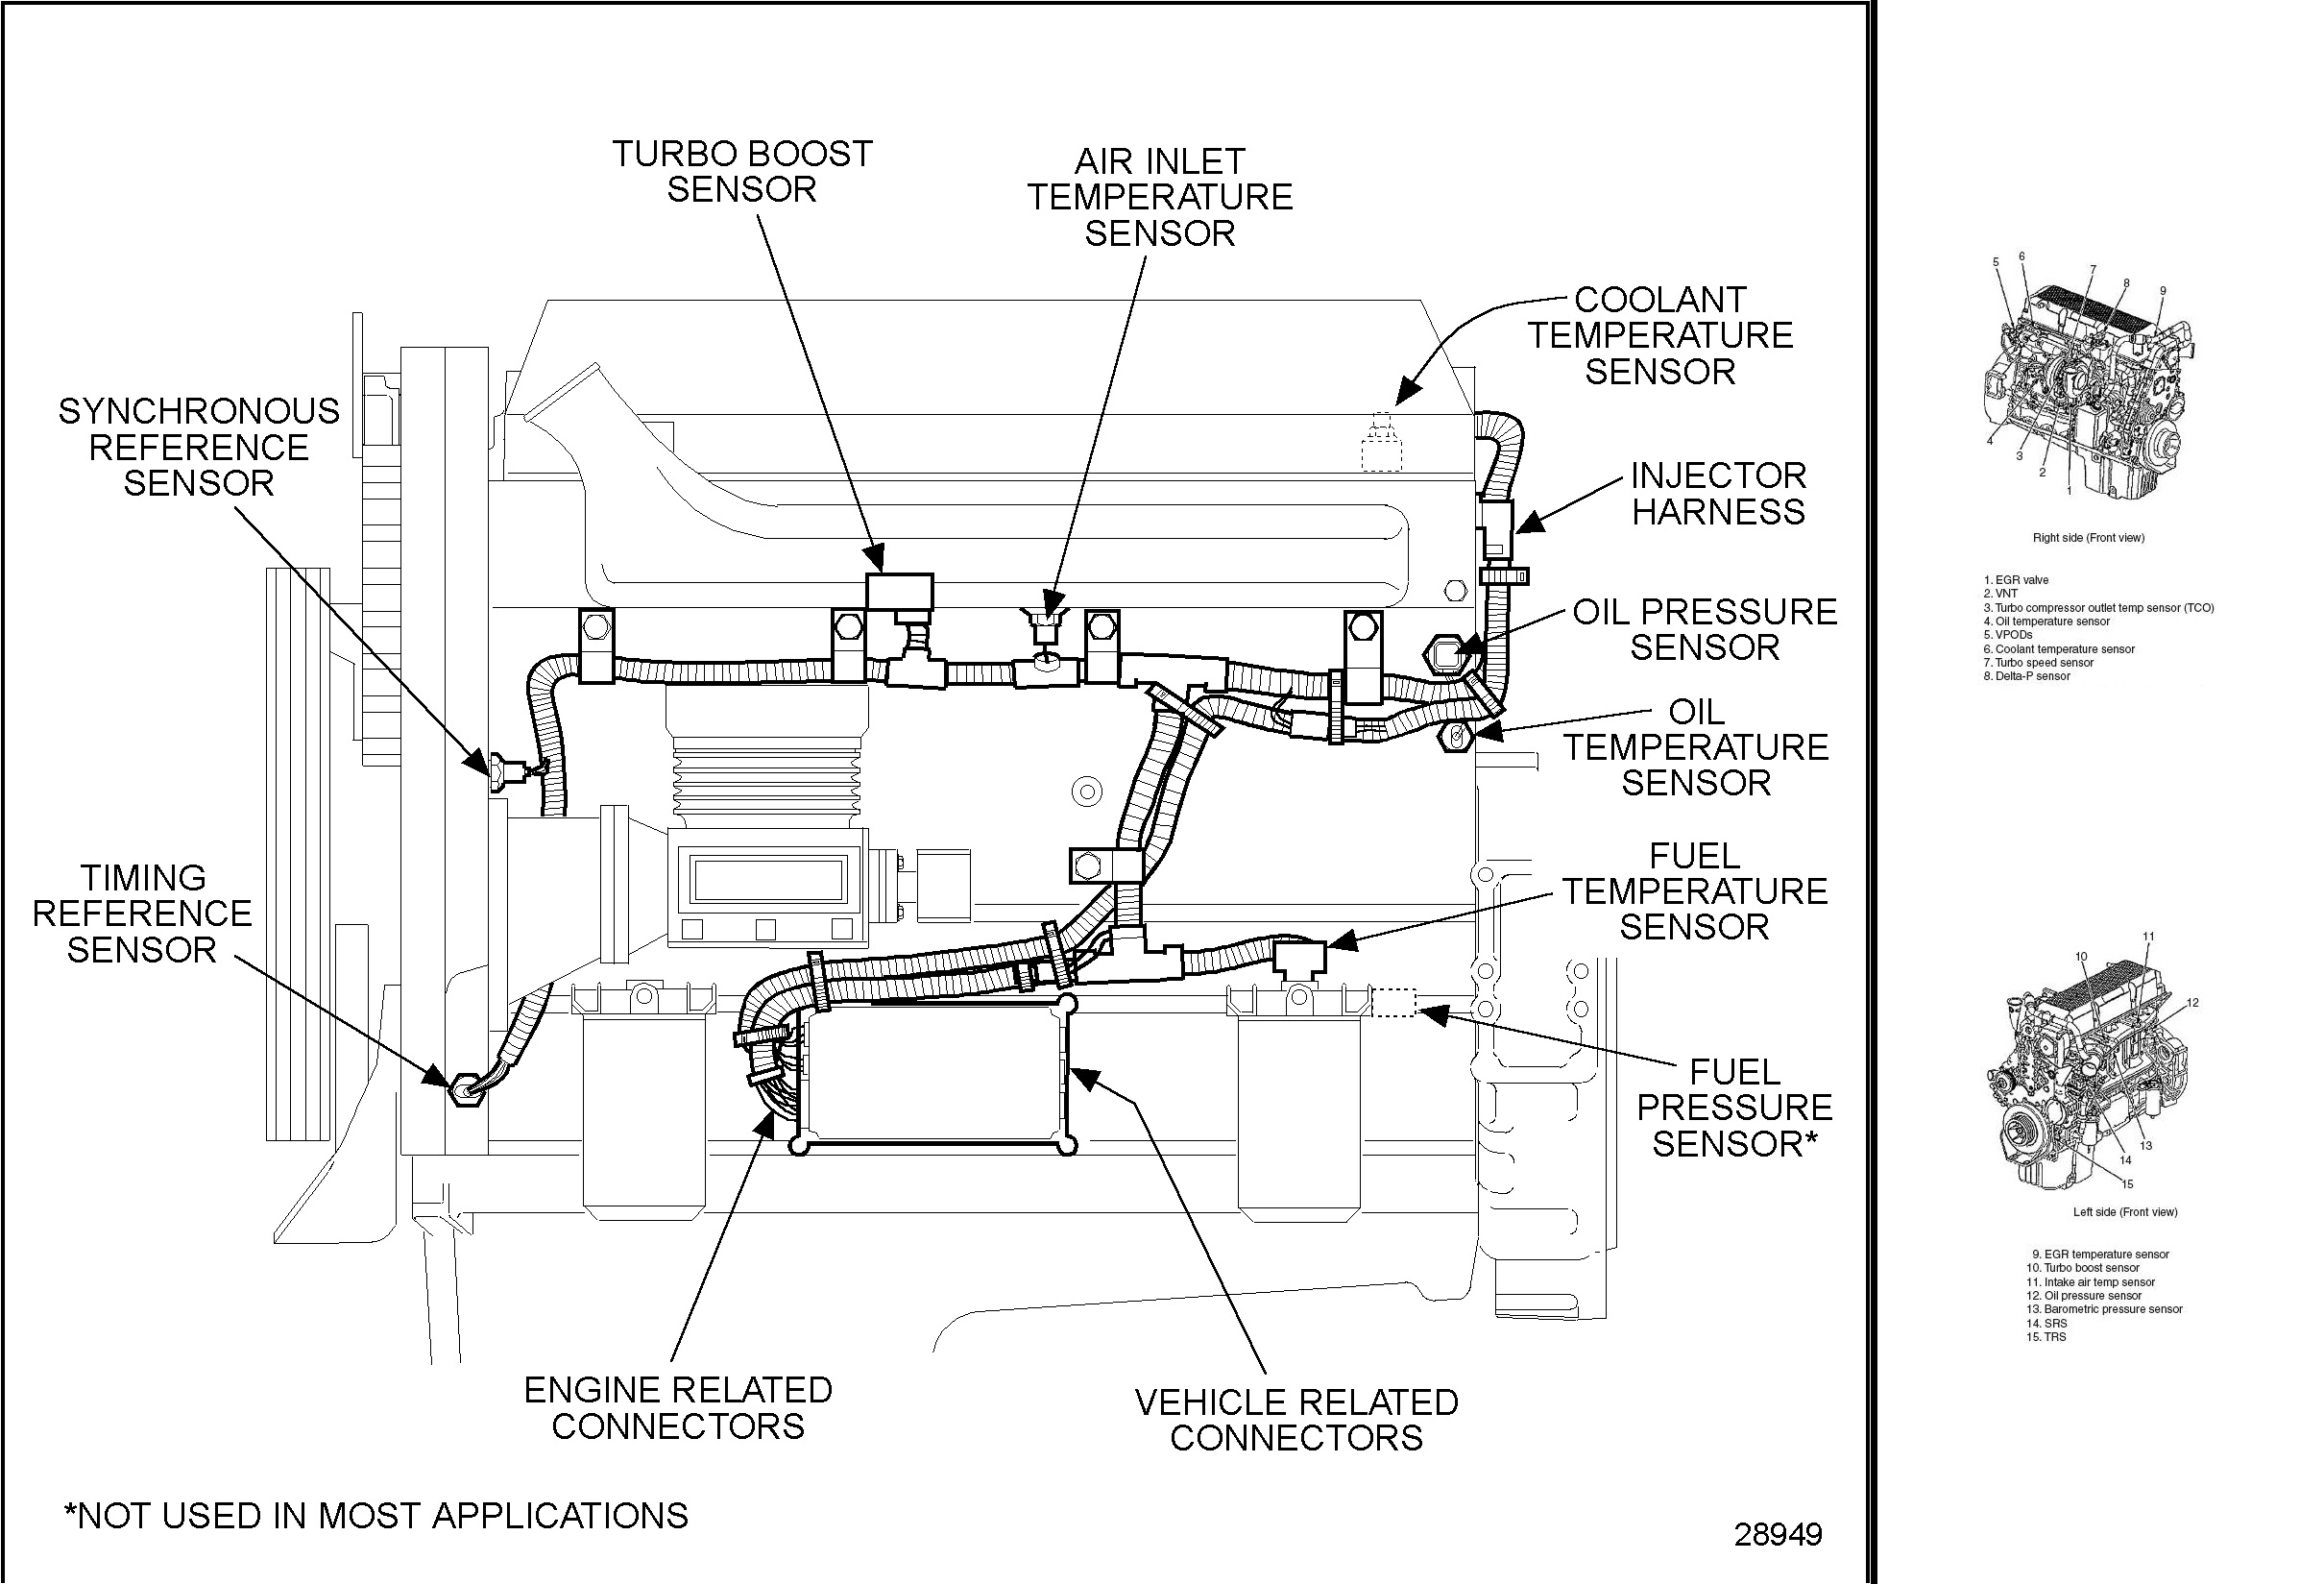 medium resolution of detroit diesel 60 engine sensors positions diagram